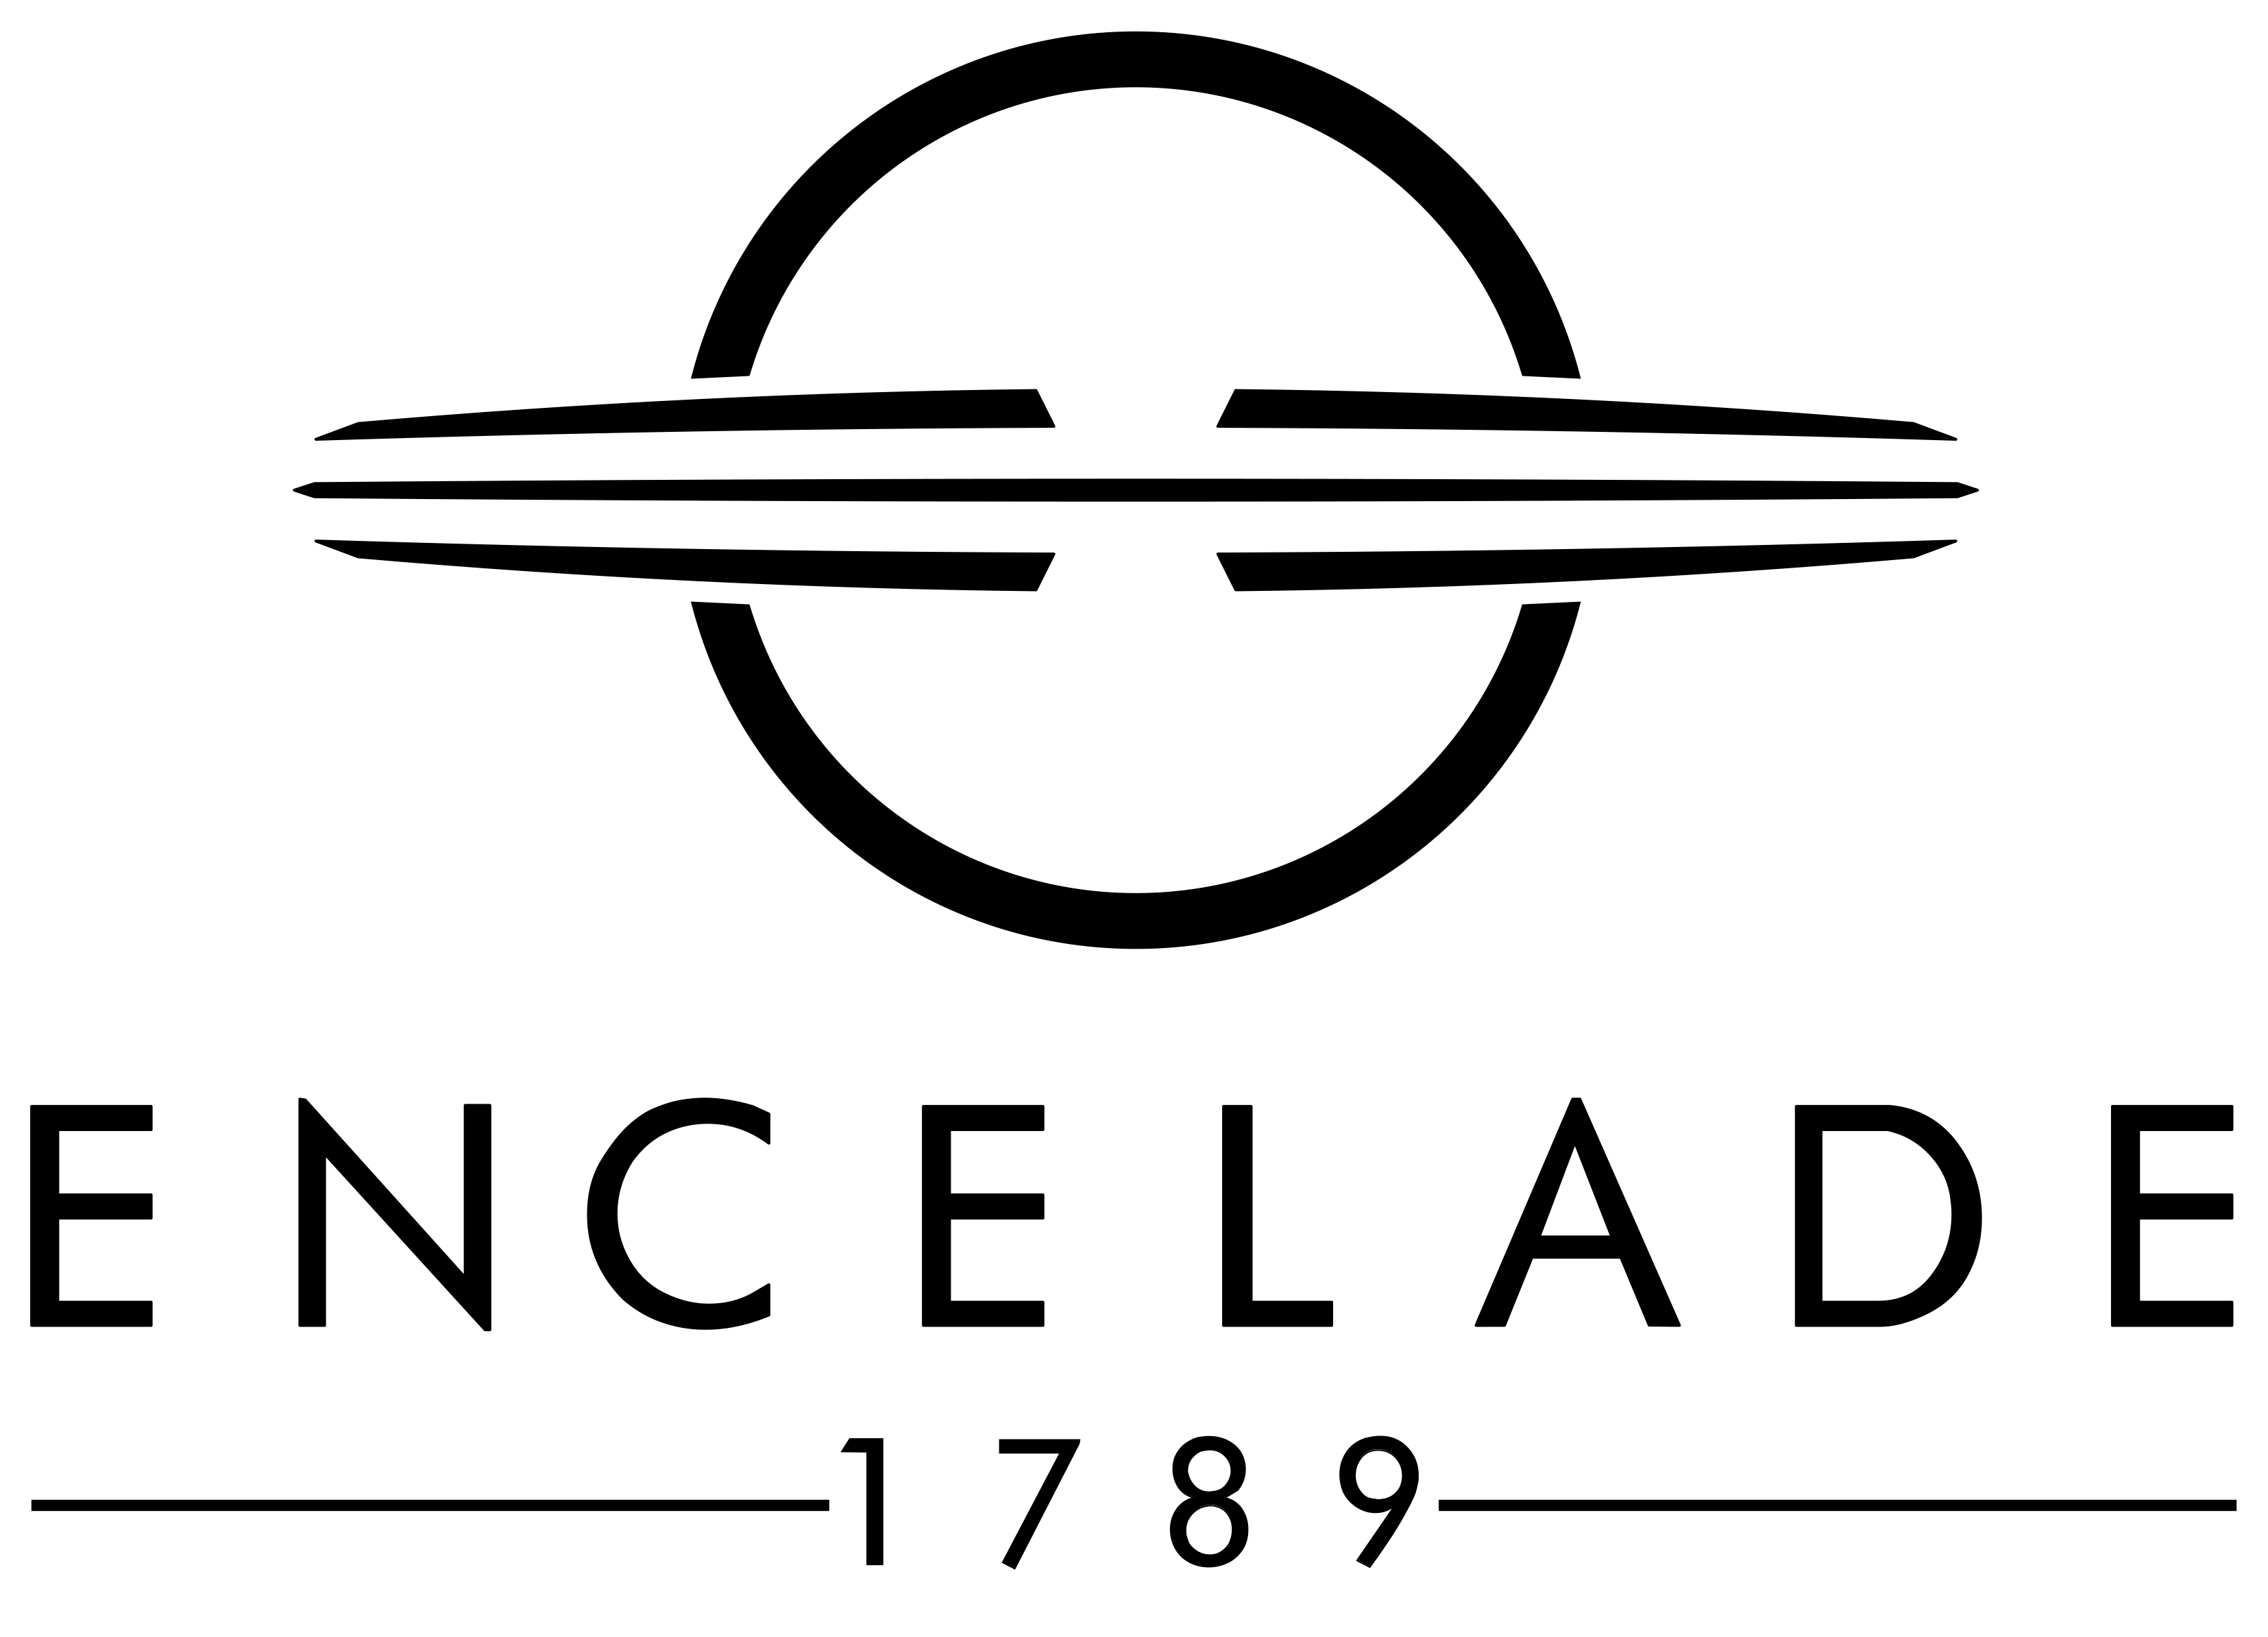 Encelade-1789